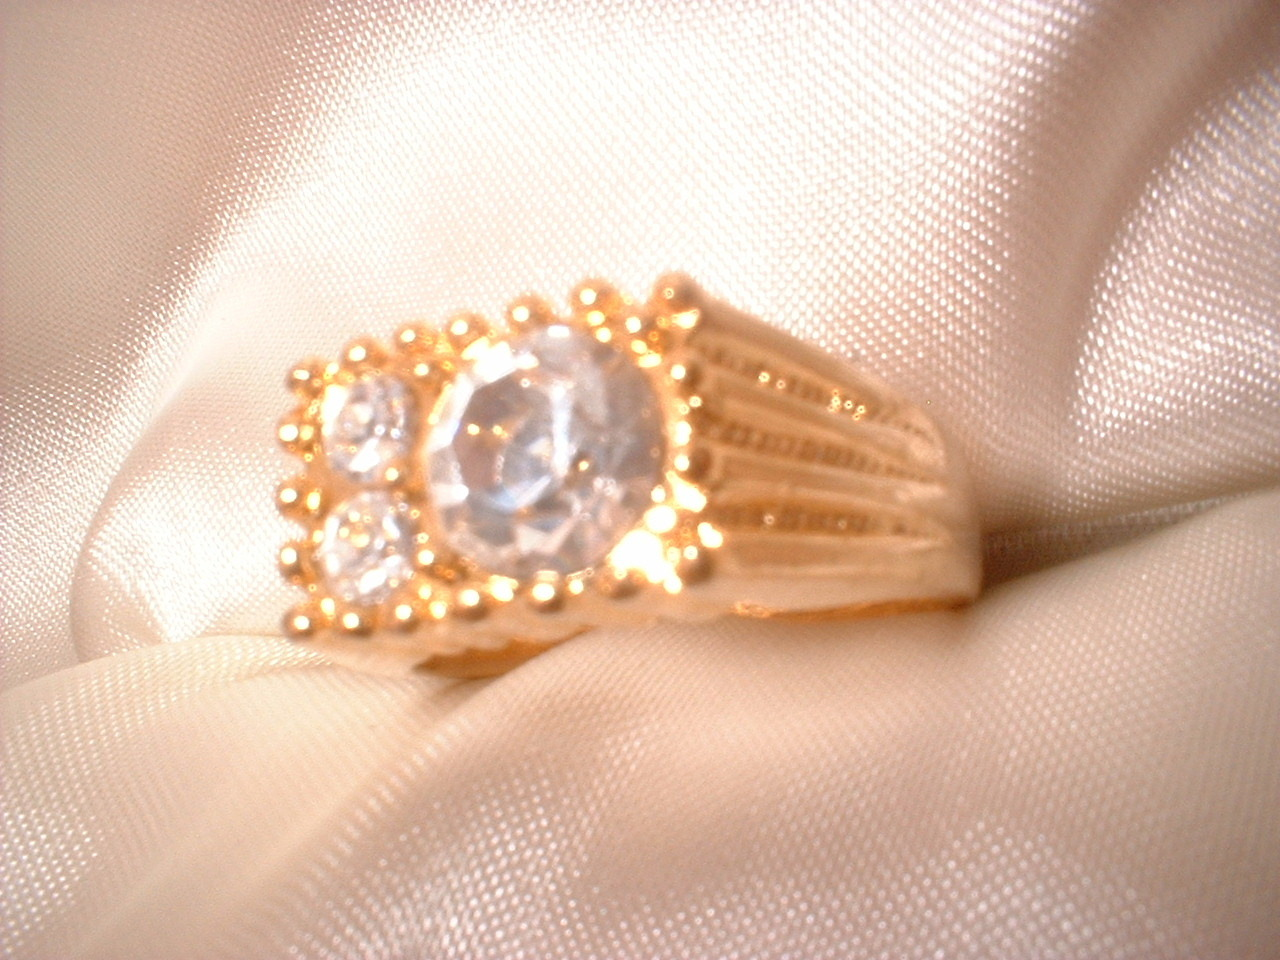 Bb mens 3 stone ring